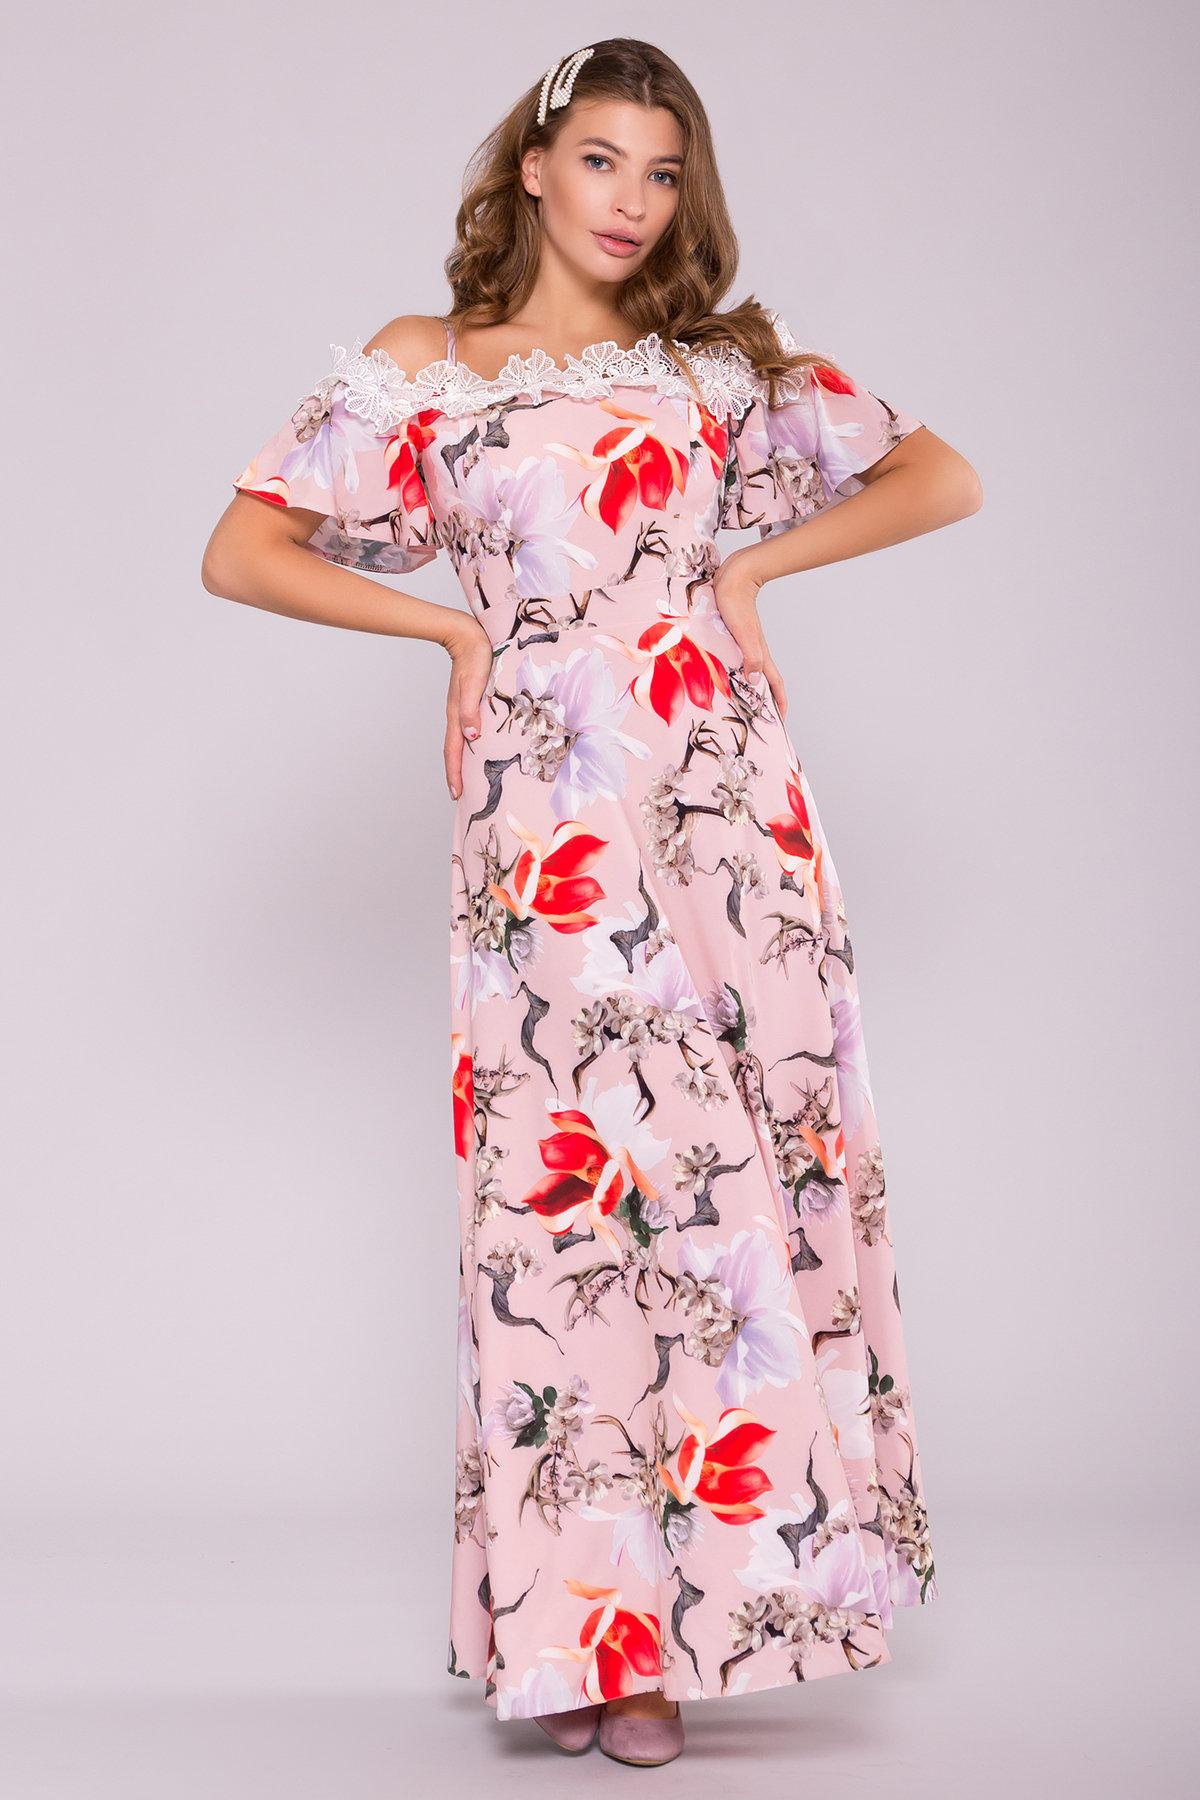 Платье Монриа 7056 Цвет: цветы комби пудра/ коралл